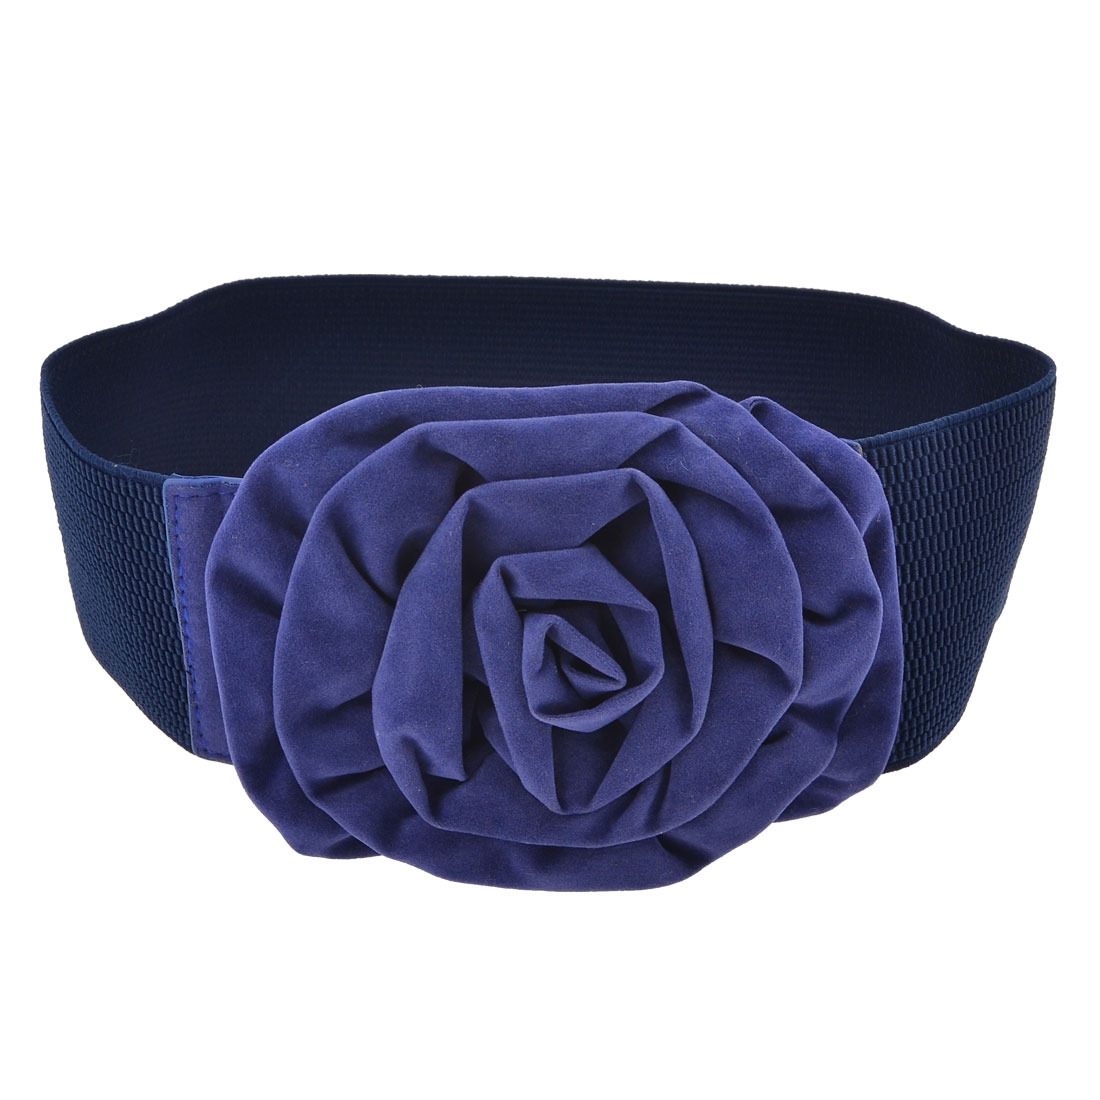 Ladies Rose Decor Textured Elastic Waist Belt Corset Cinch Band Navy Blue